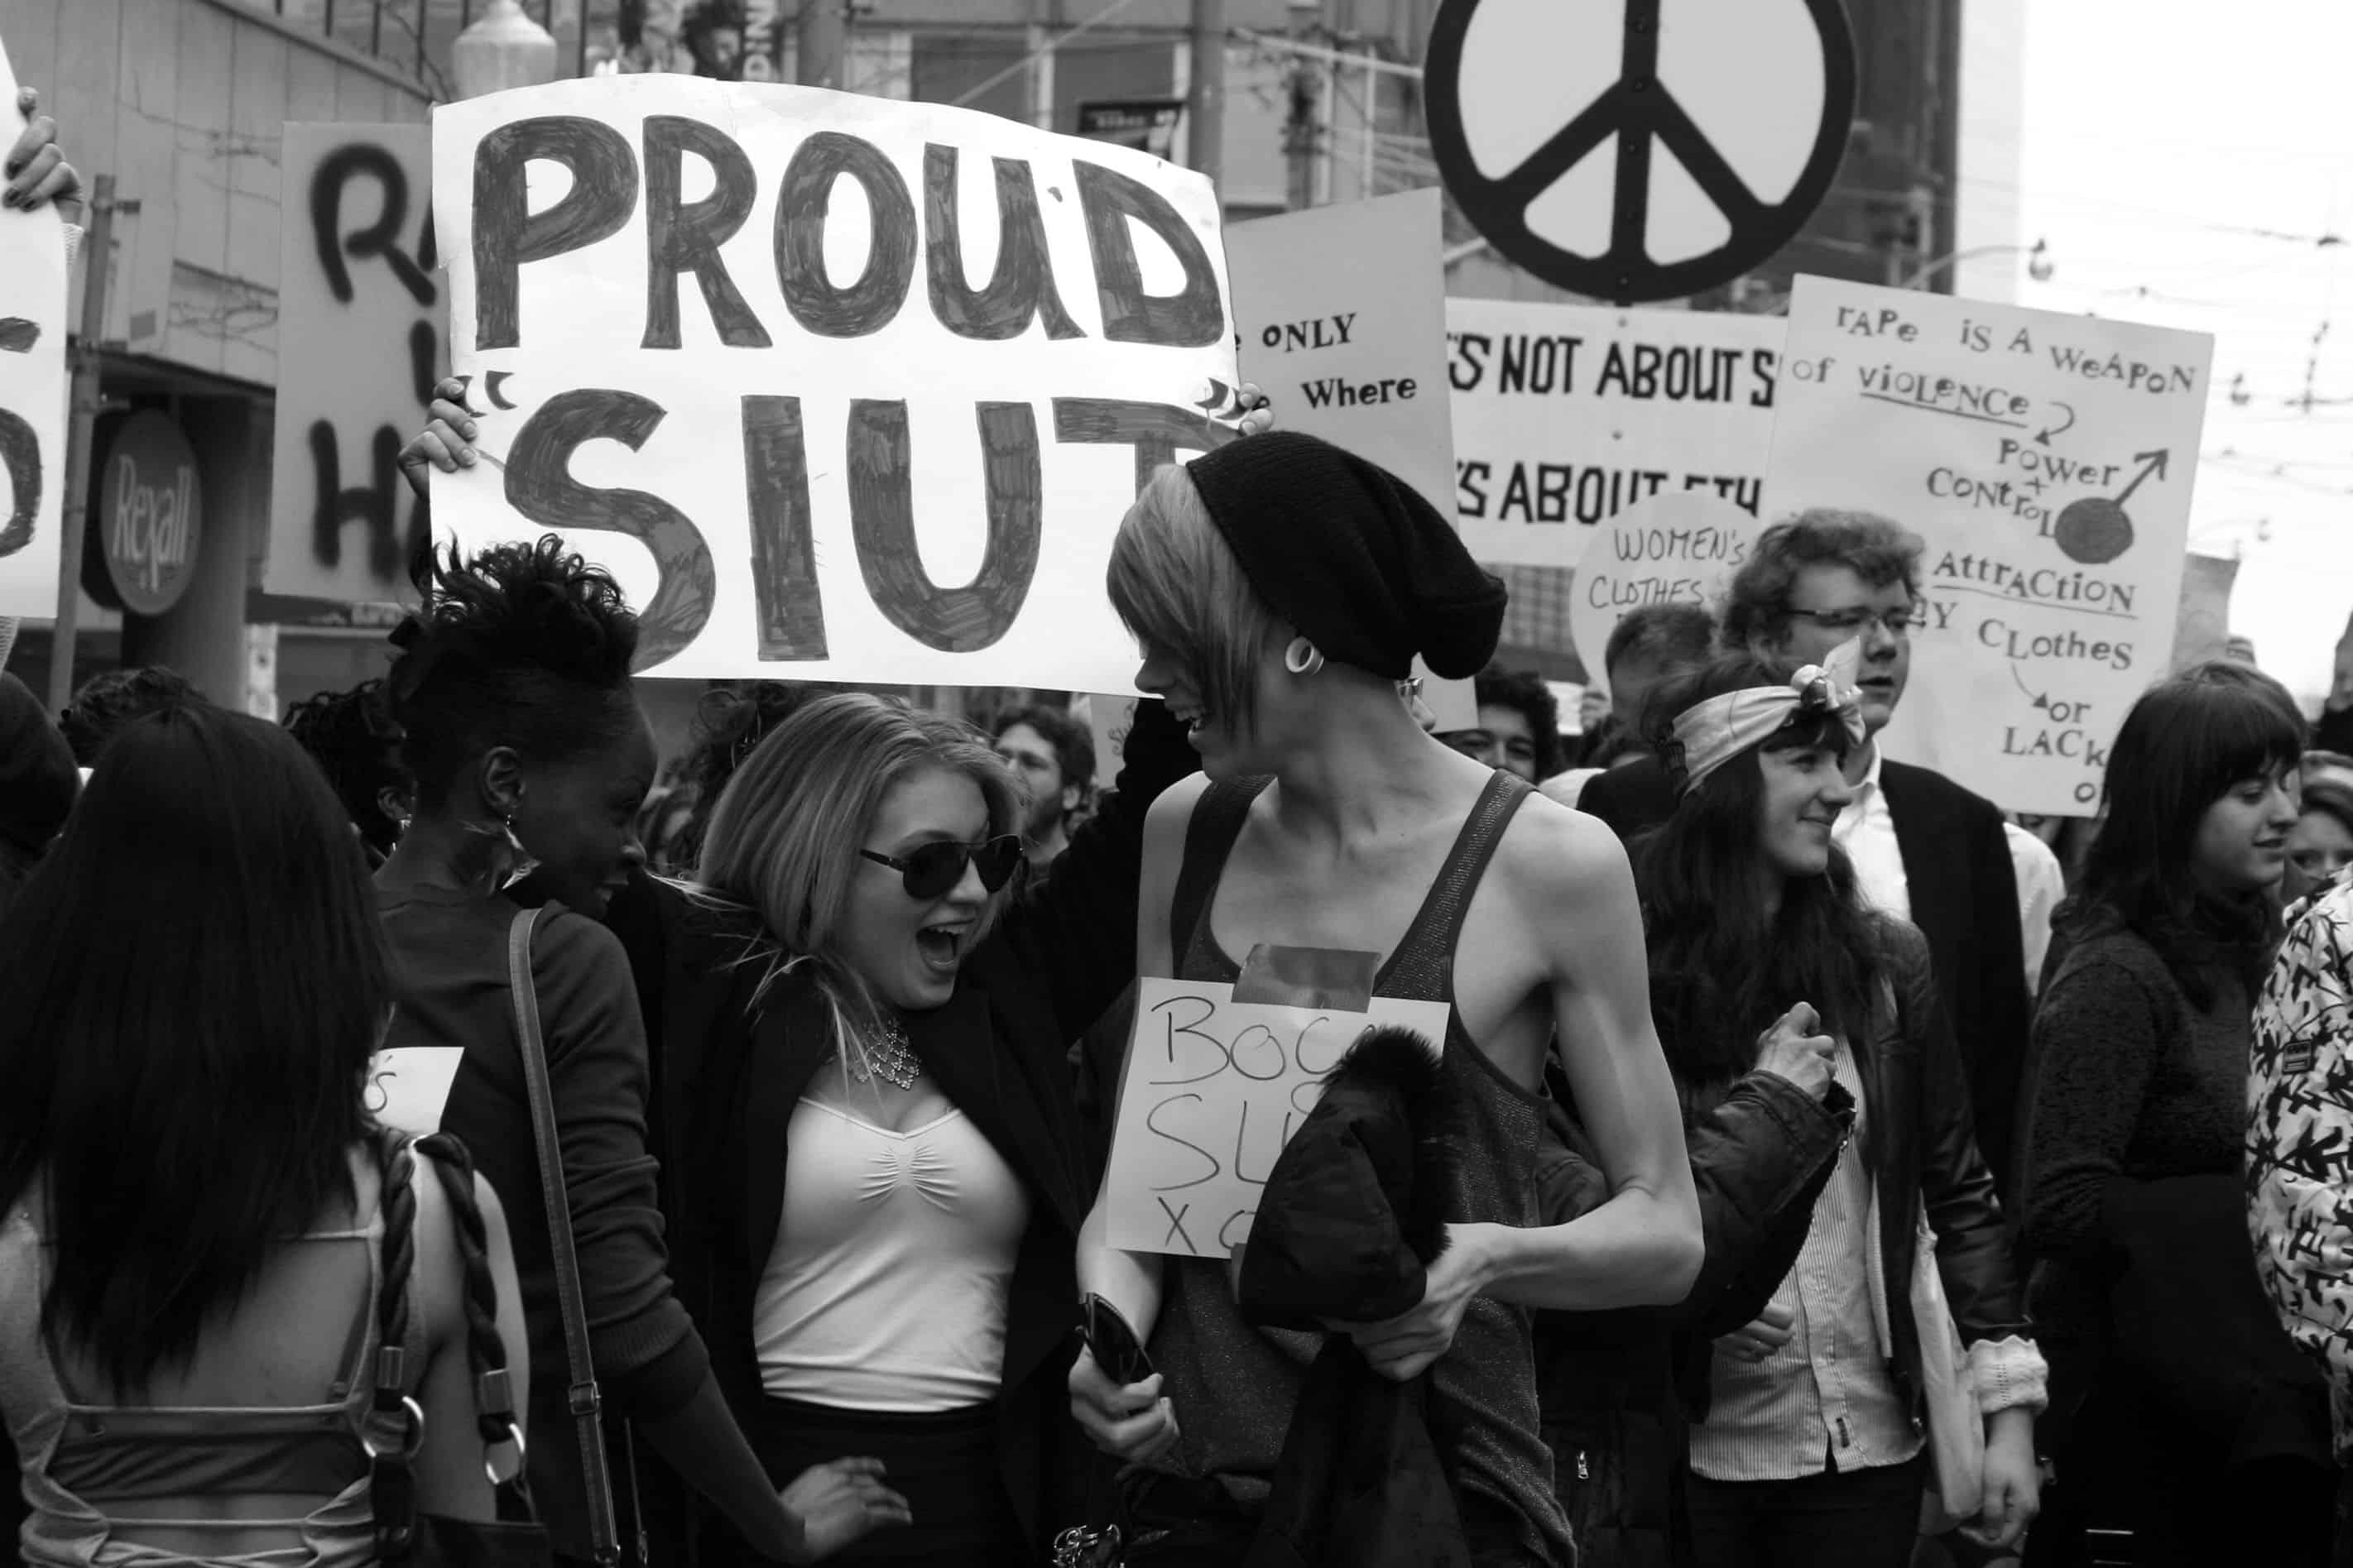 Slut walks, pictured here, aim to reclaim the word